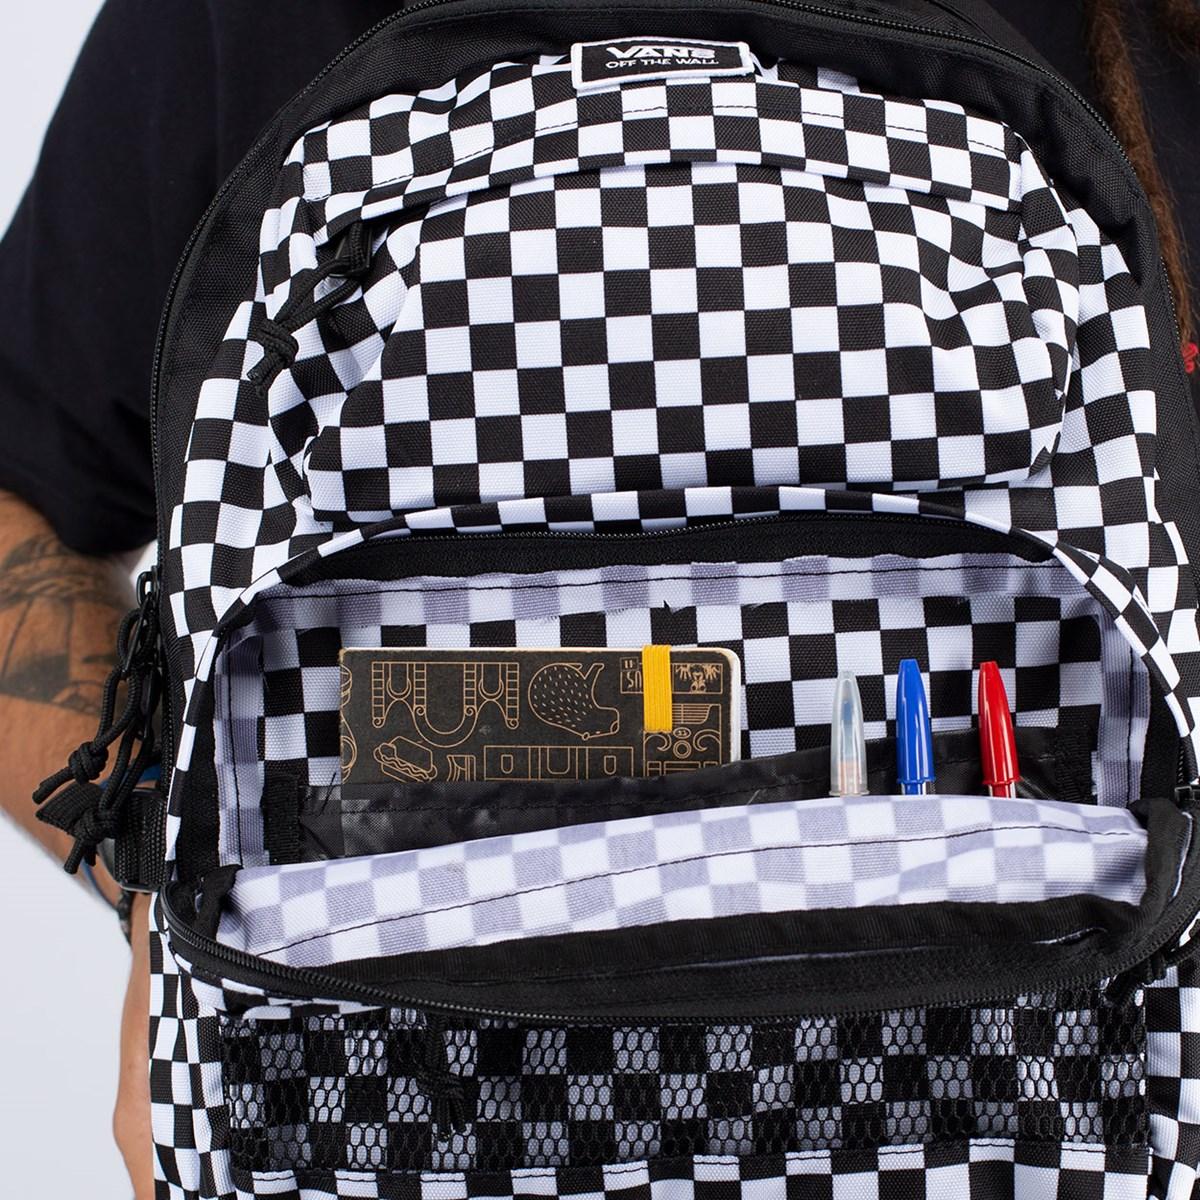 Mochila Vans Stasher Backpack Checkerboard VN0A4S6Y705